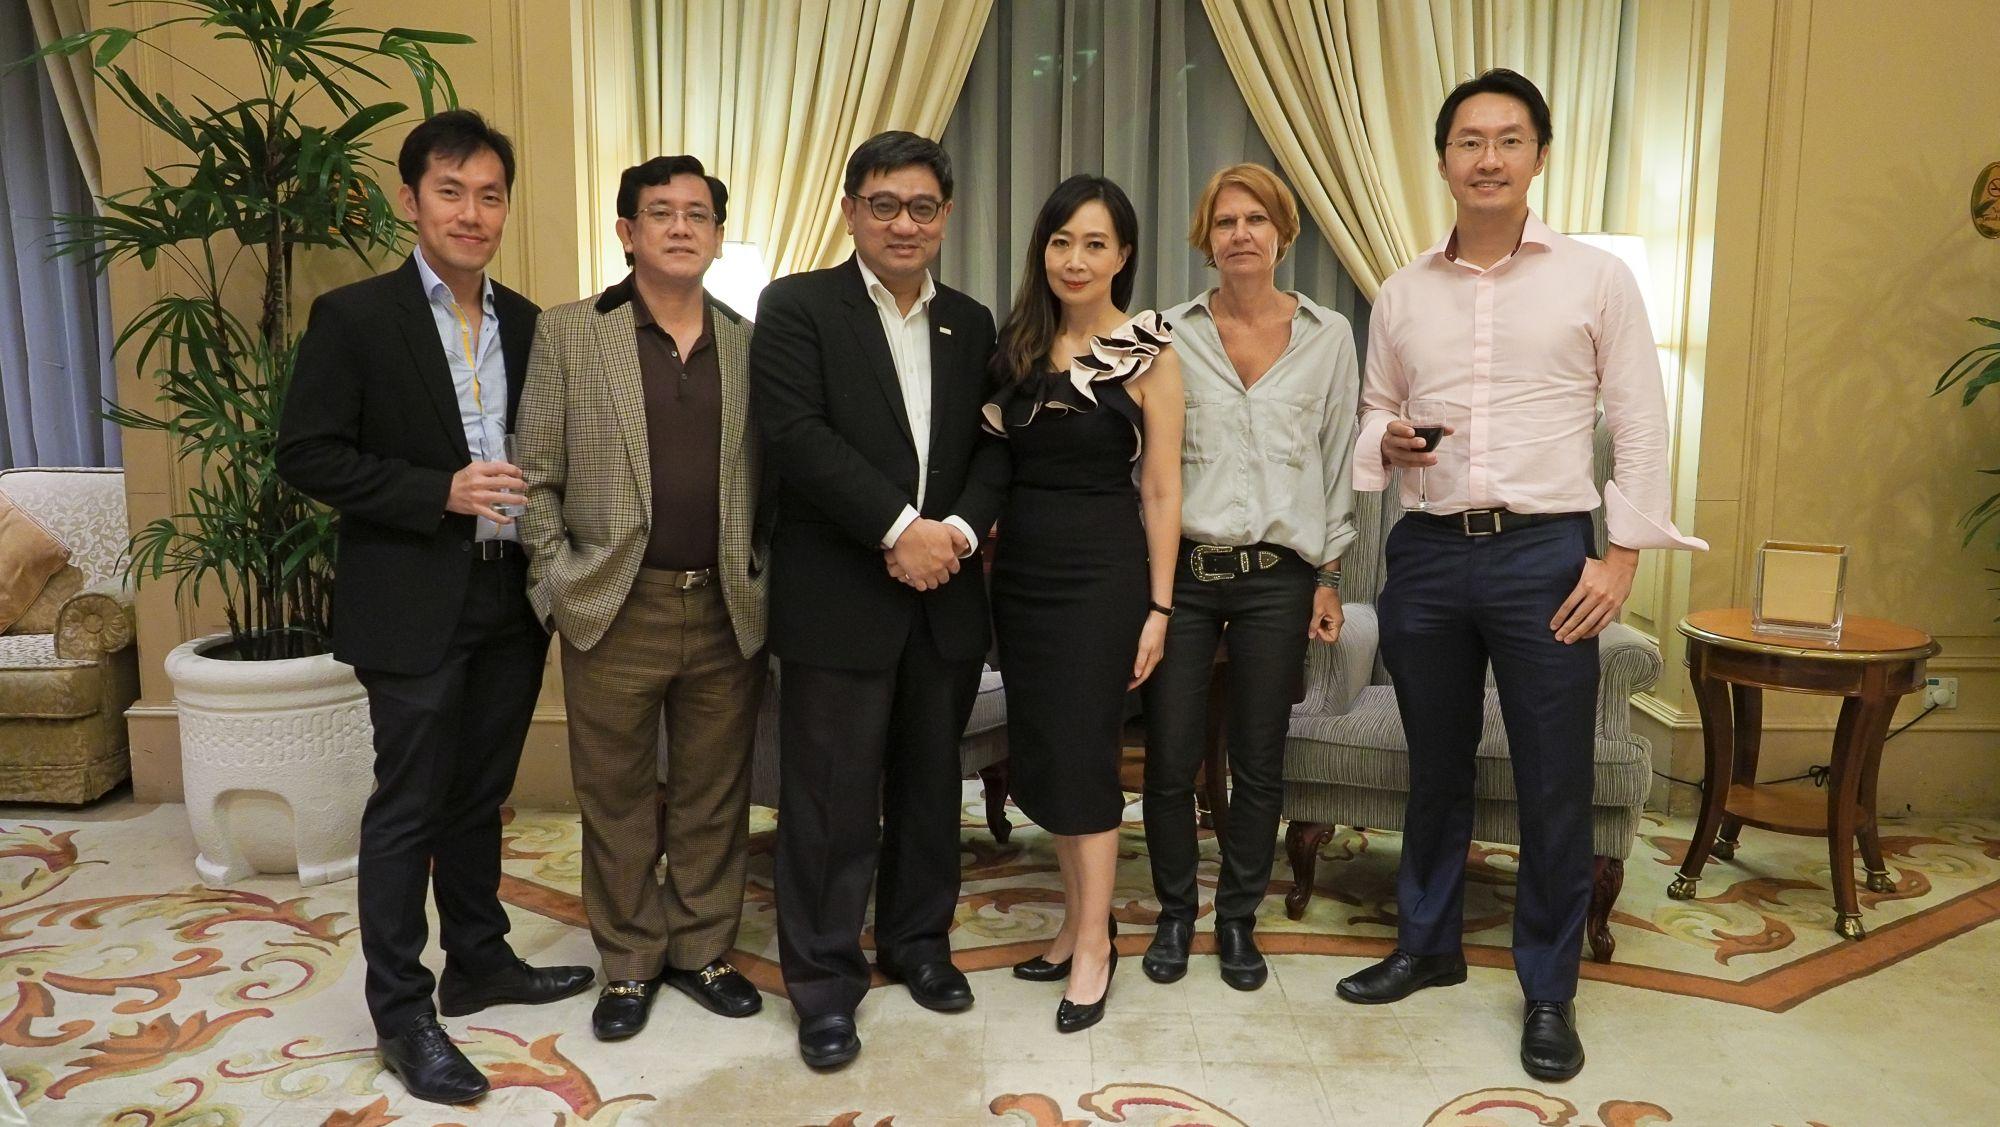 Sean Quek, Peter Tan Shou Yi, Rizwi Wun, Irene SM Lee, Jutta Odenwaelder, Steven Yeah